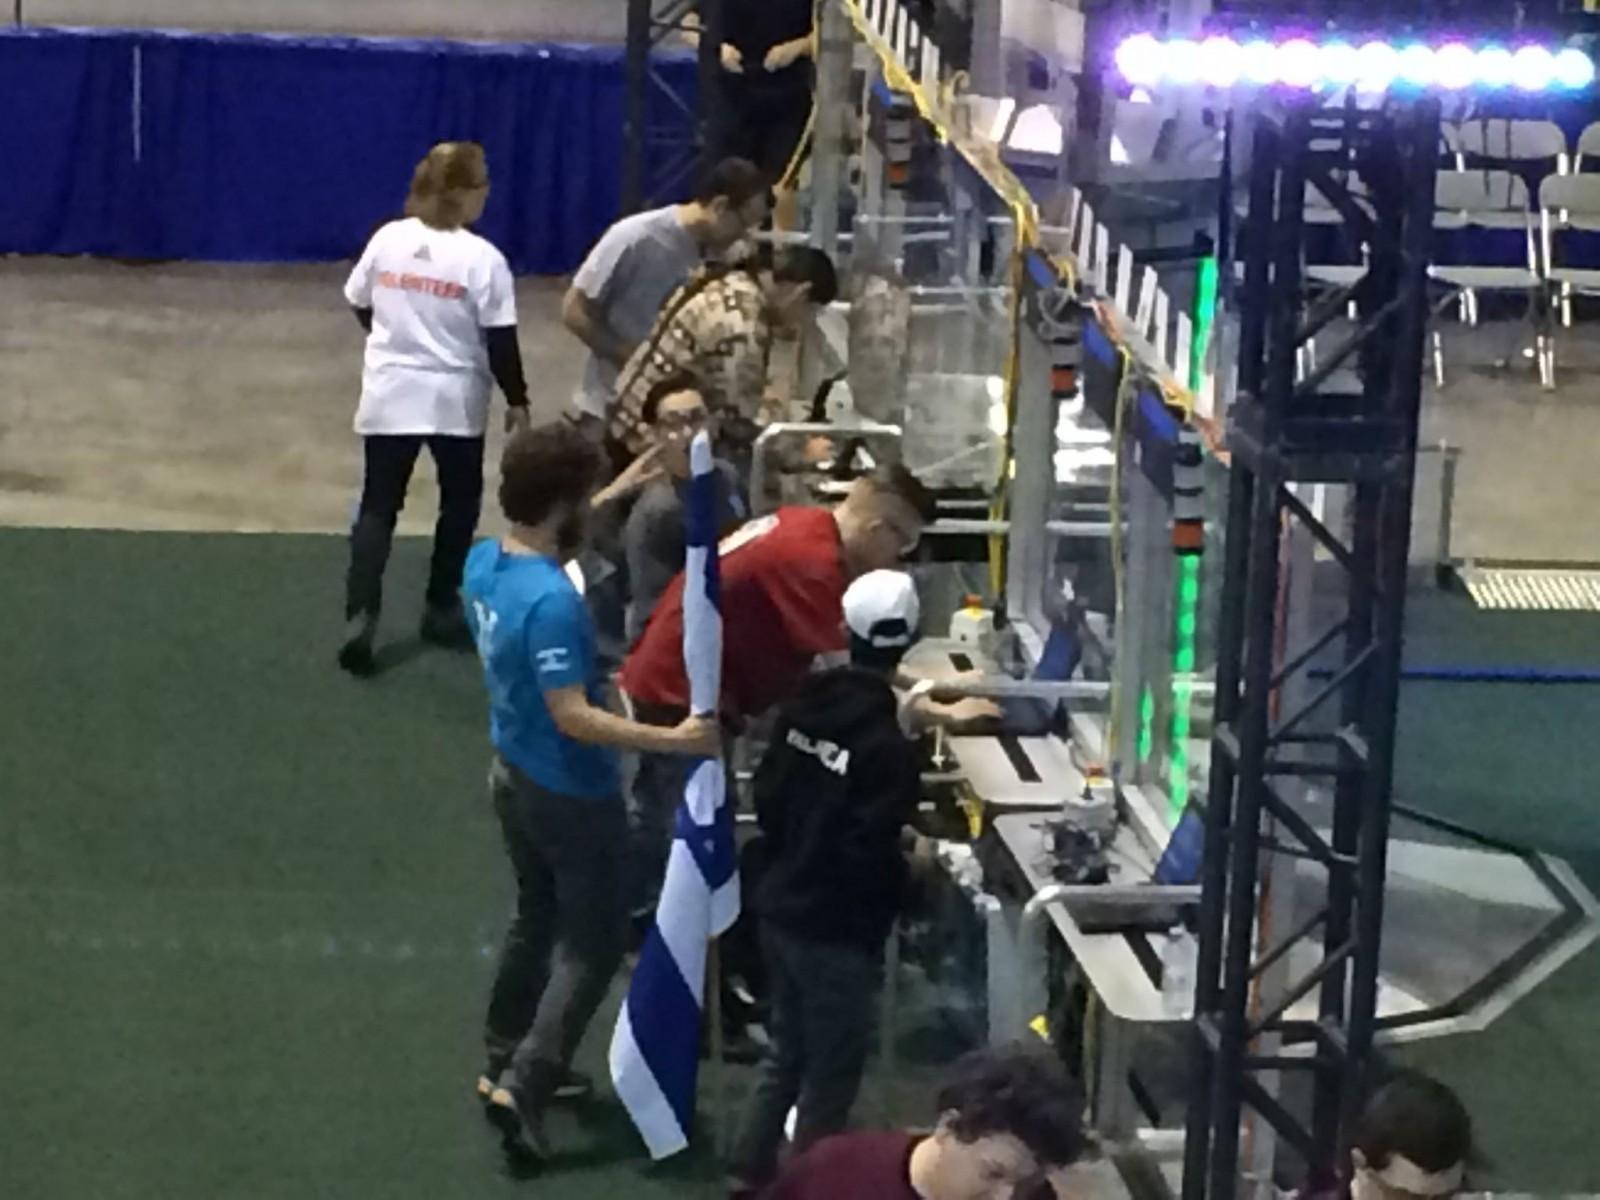 Father Mercredi robotics team headed to world championships